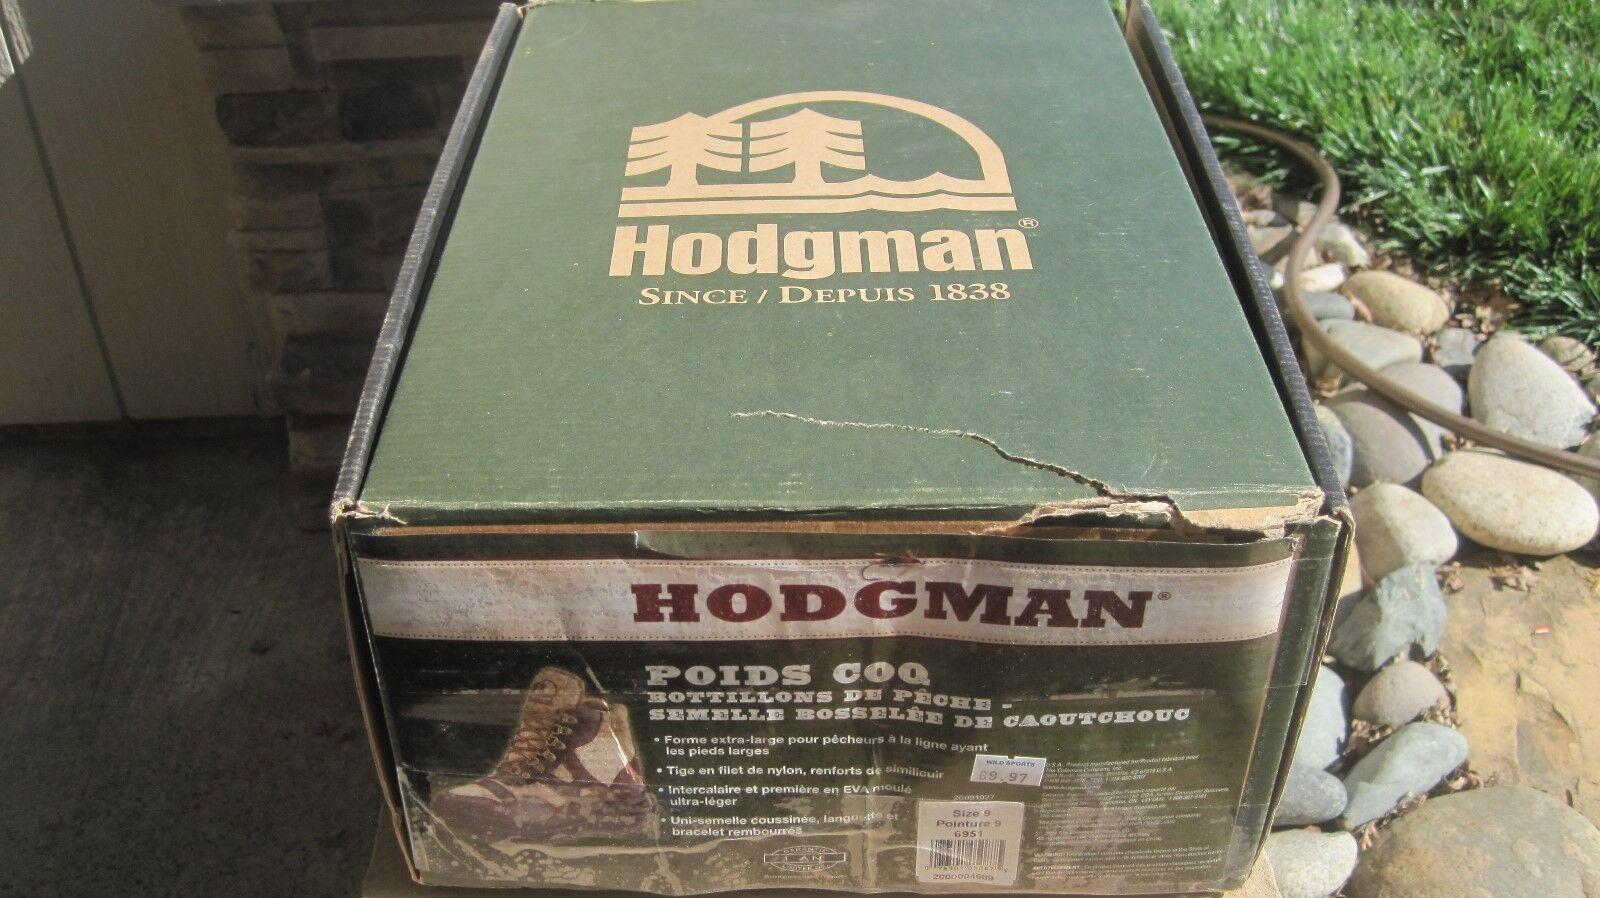 Hodgman Poids COQ Wading scarpe Rubber Nipple Sole 6951 marrone Uomo 9 NEW